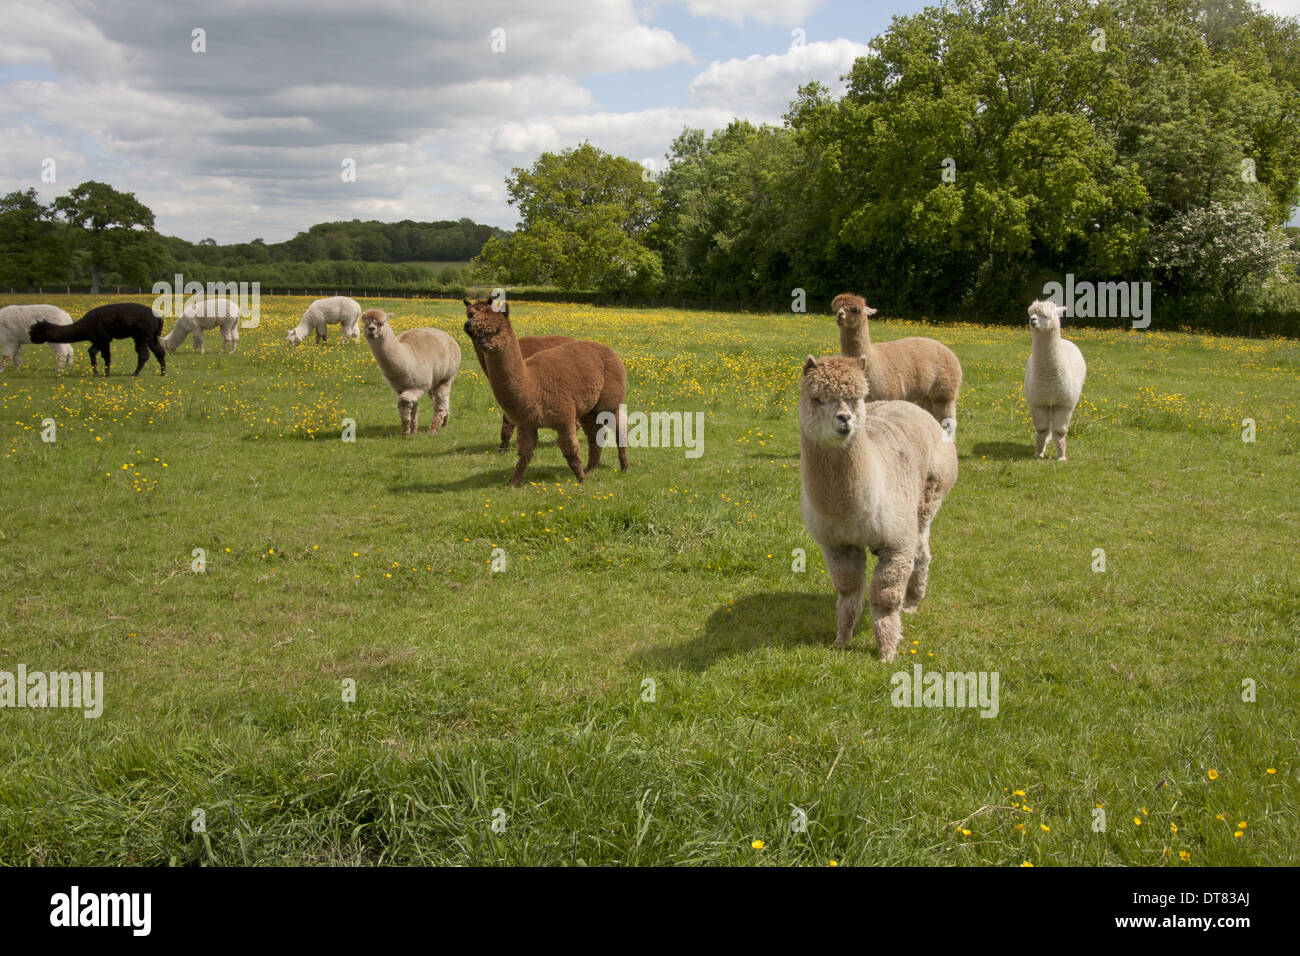 Alpaca (Lama pacos) adults, herd standing in pasture, West Sussex, England, June - Stock Image